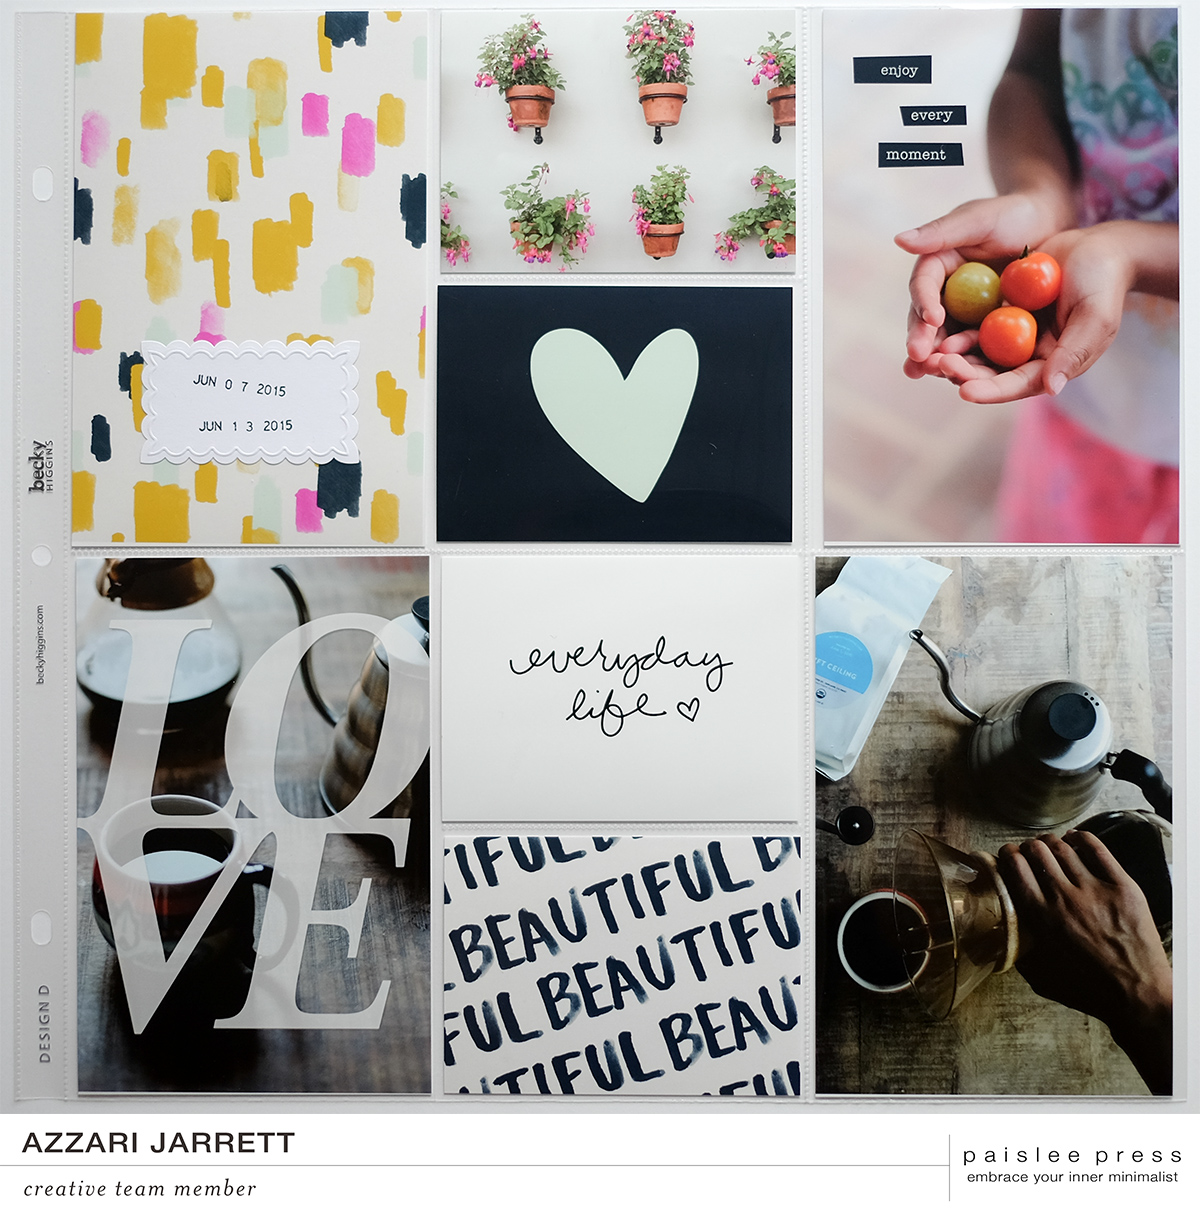 Paislee Press Joie de Vivre Project Life Layout | Azzari Jarrett